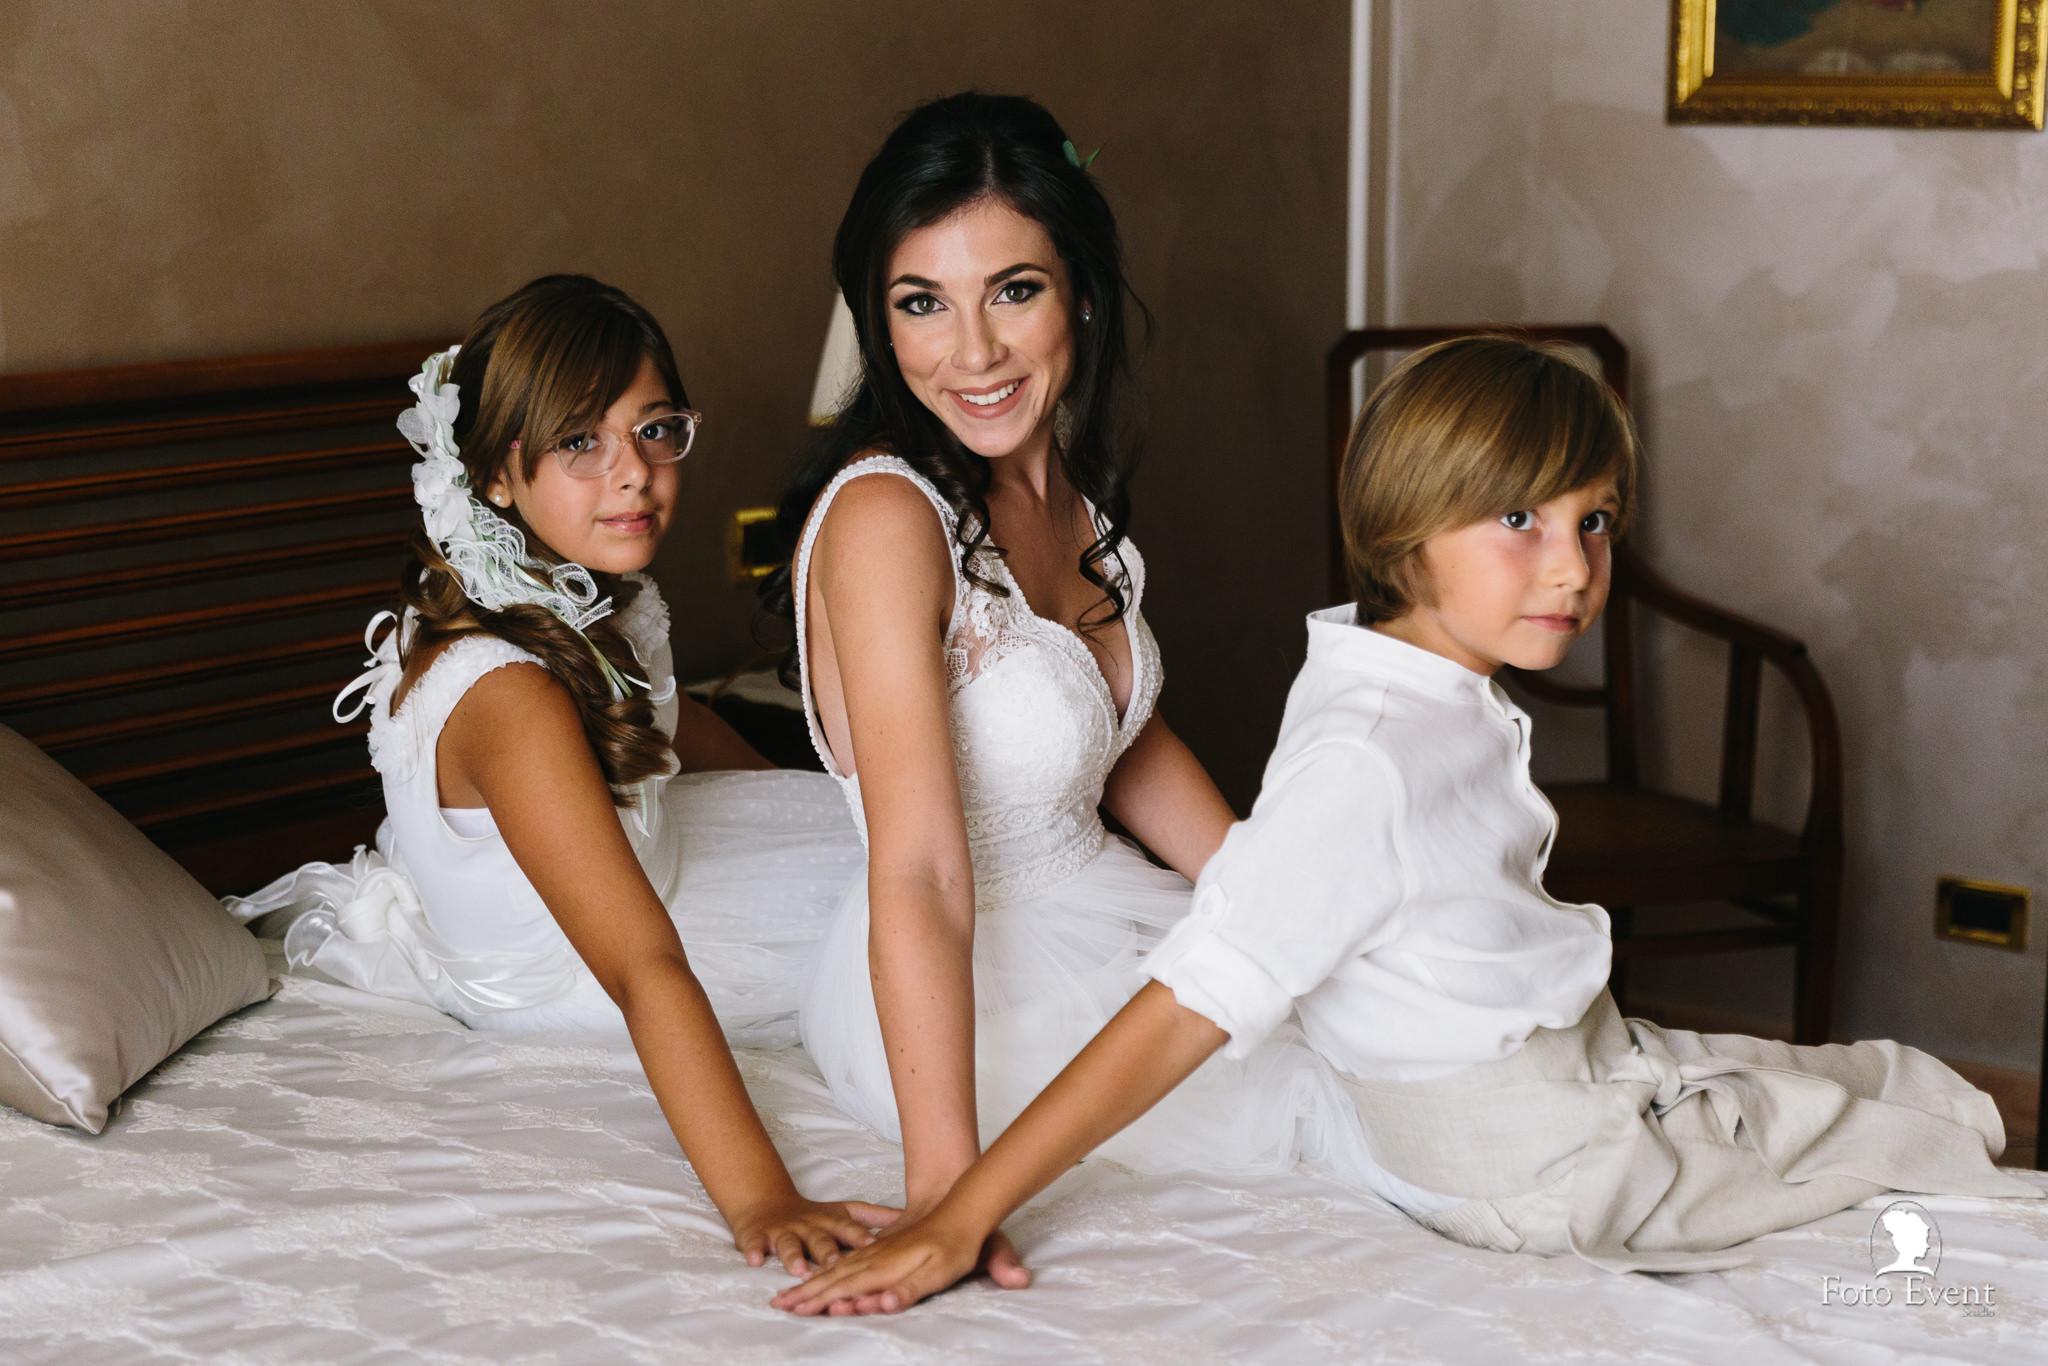 004-2019-08-23-Matrimonio-Lucia-e-Rosario-Scopelliti-5DE-976